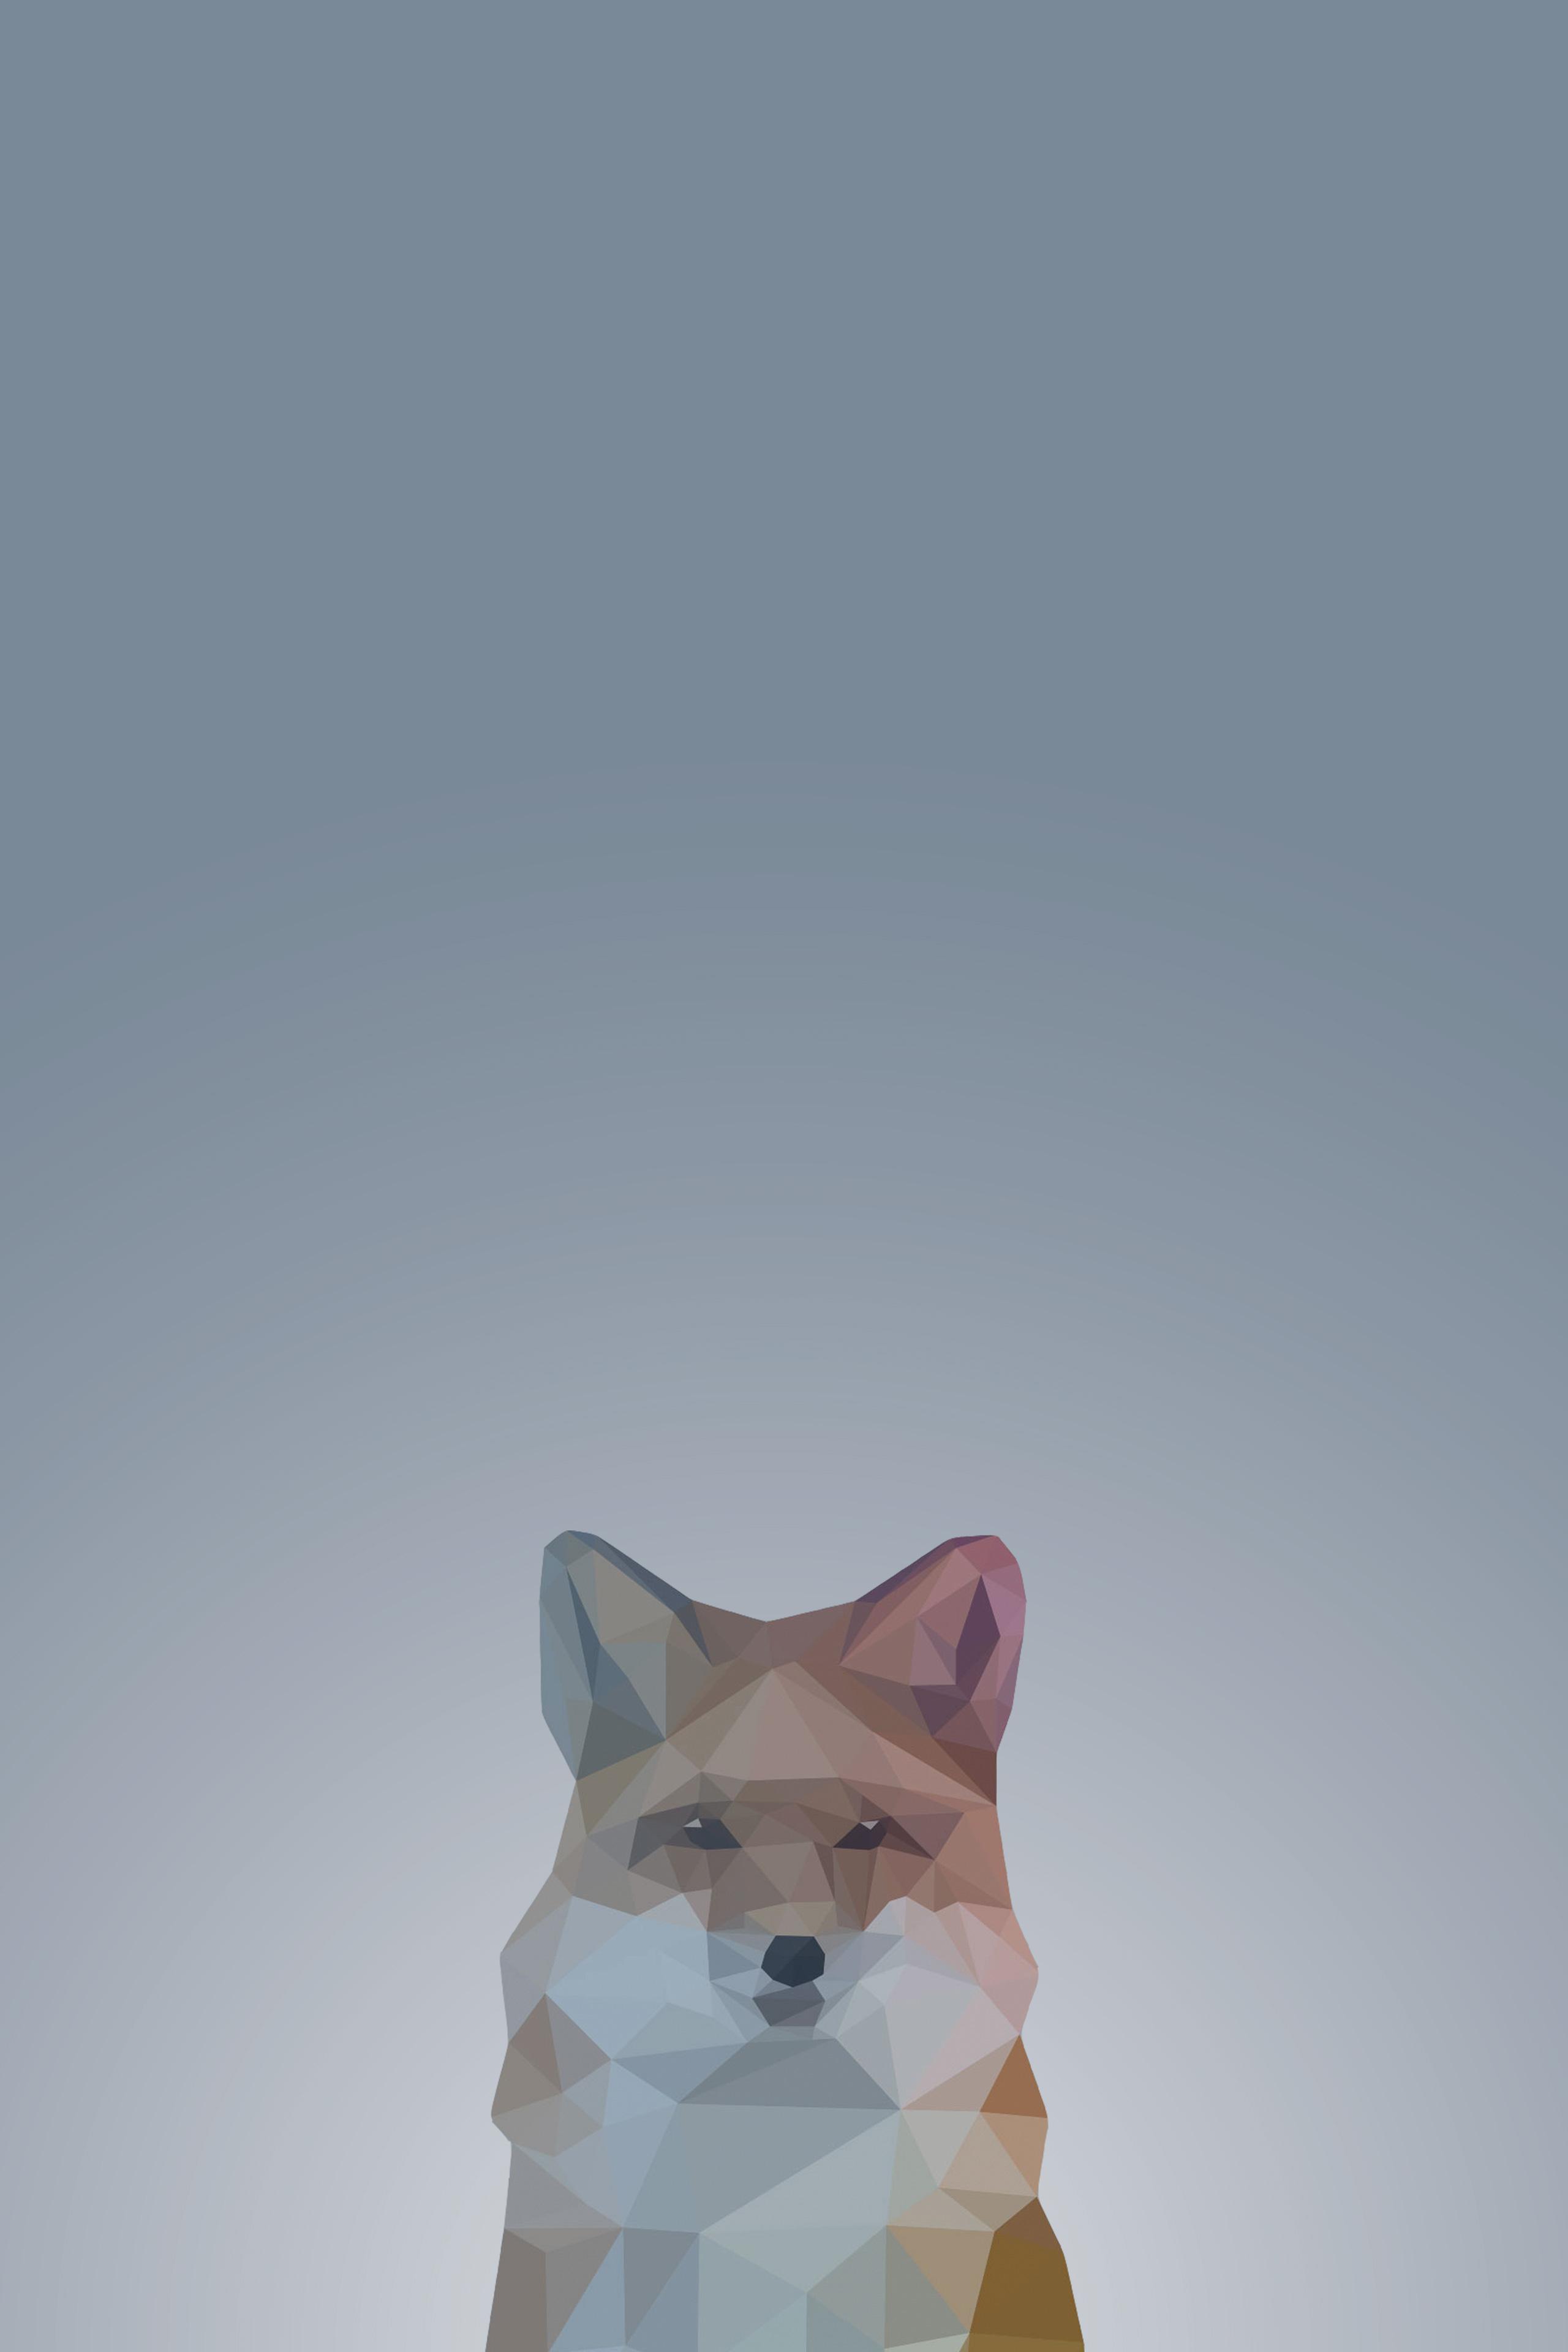 Low Poly Fox Mobile Wallpaper Miniwallist